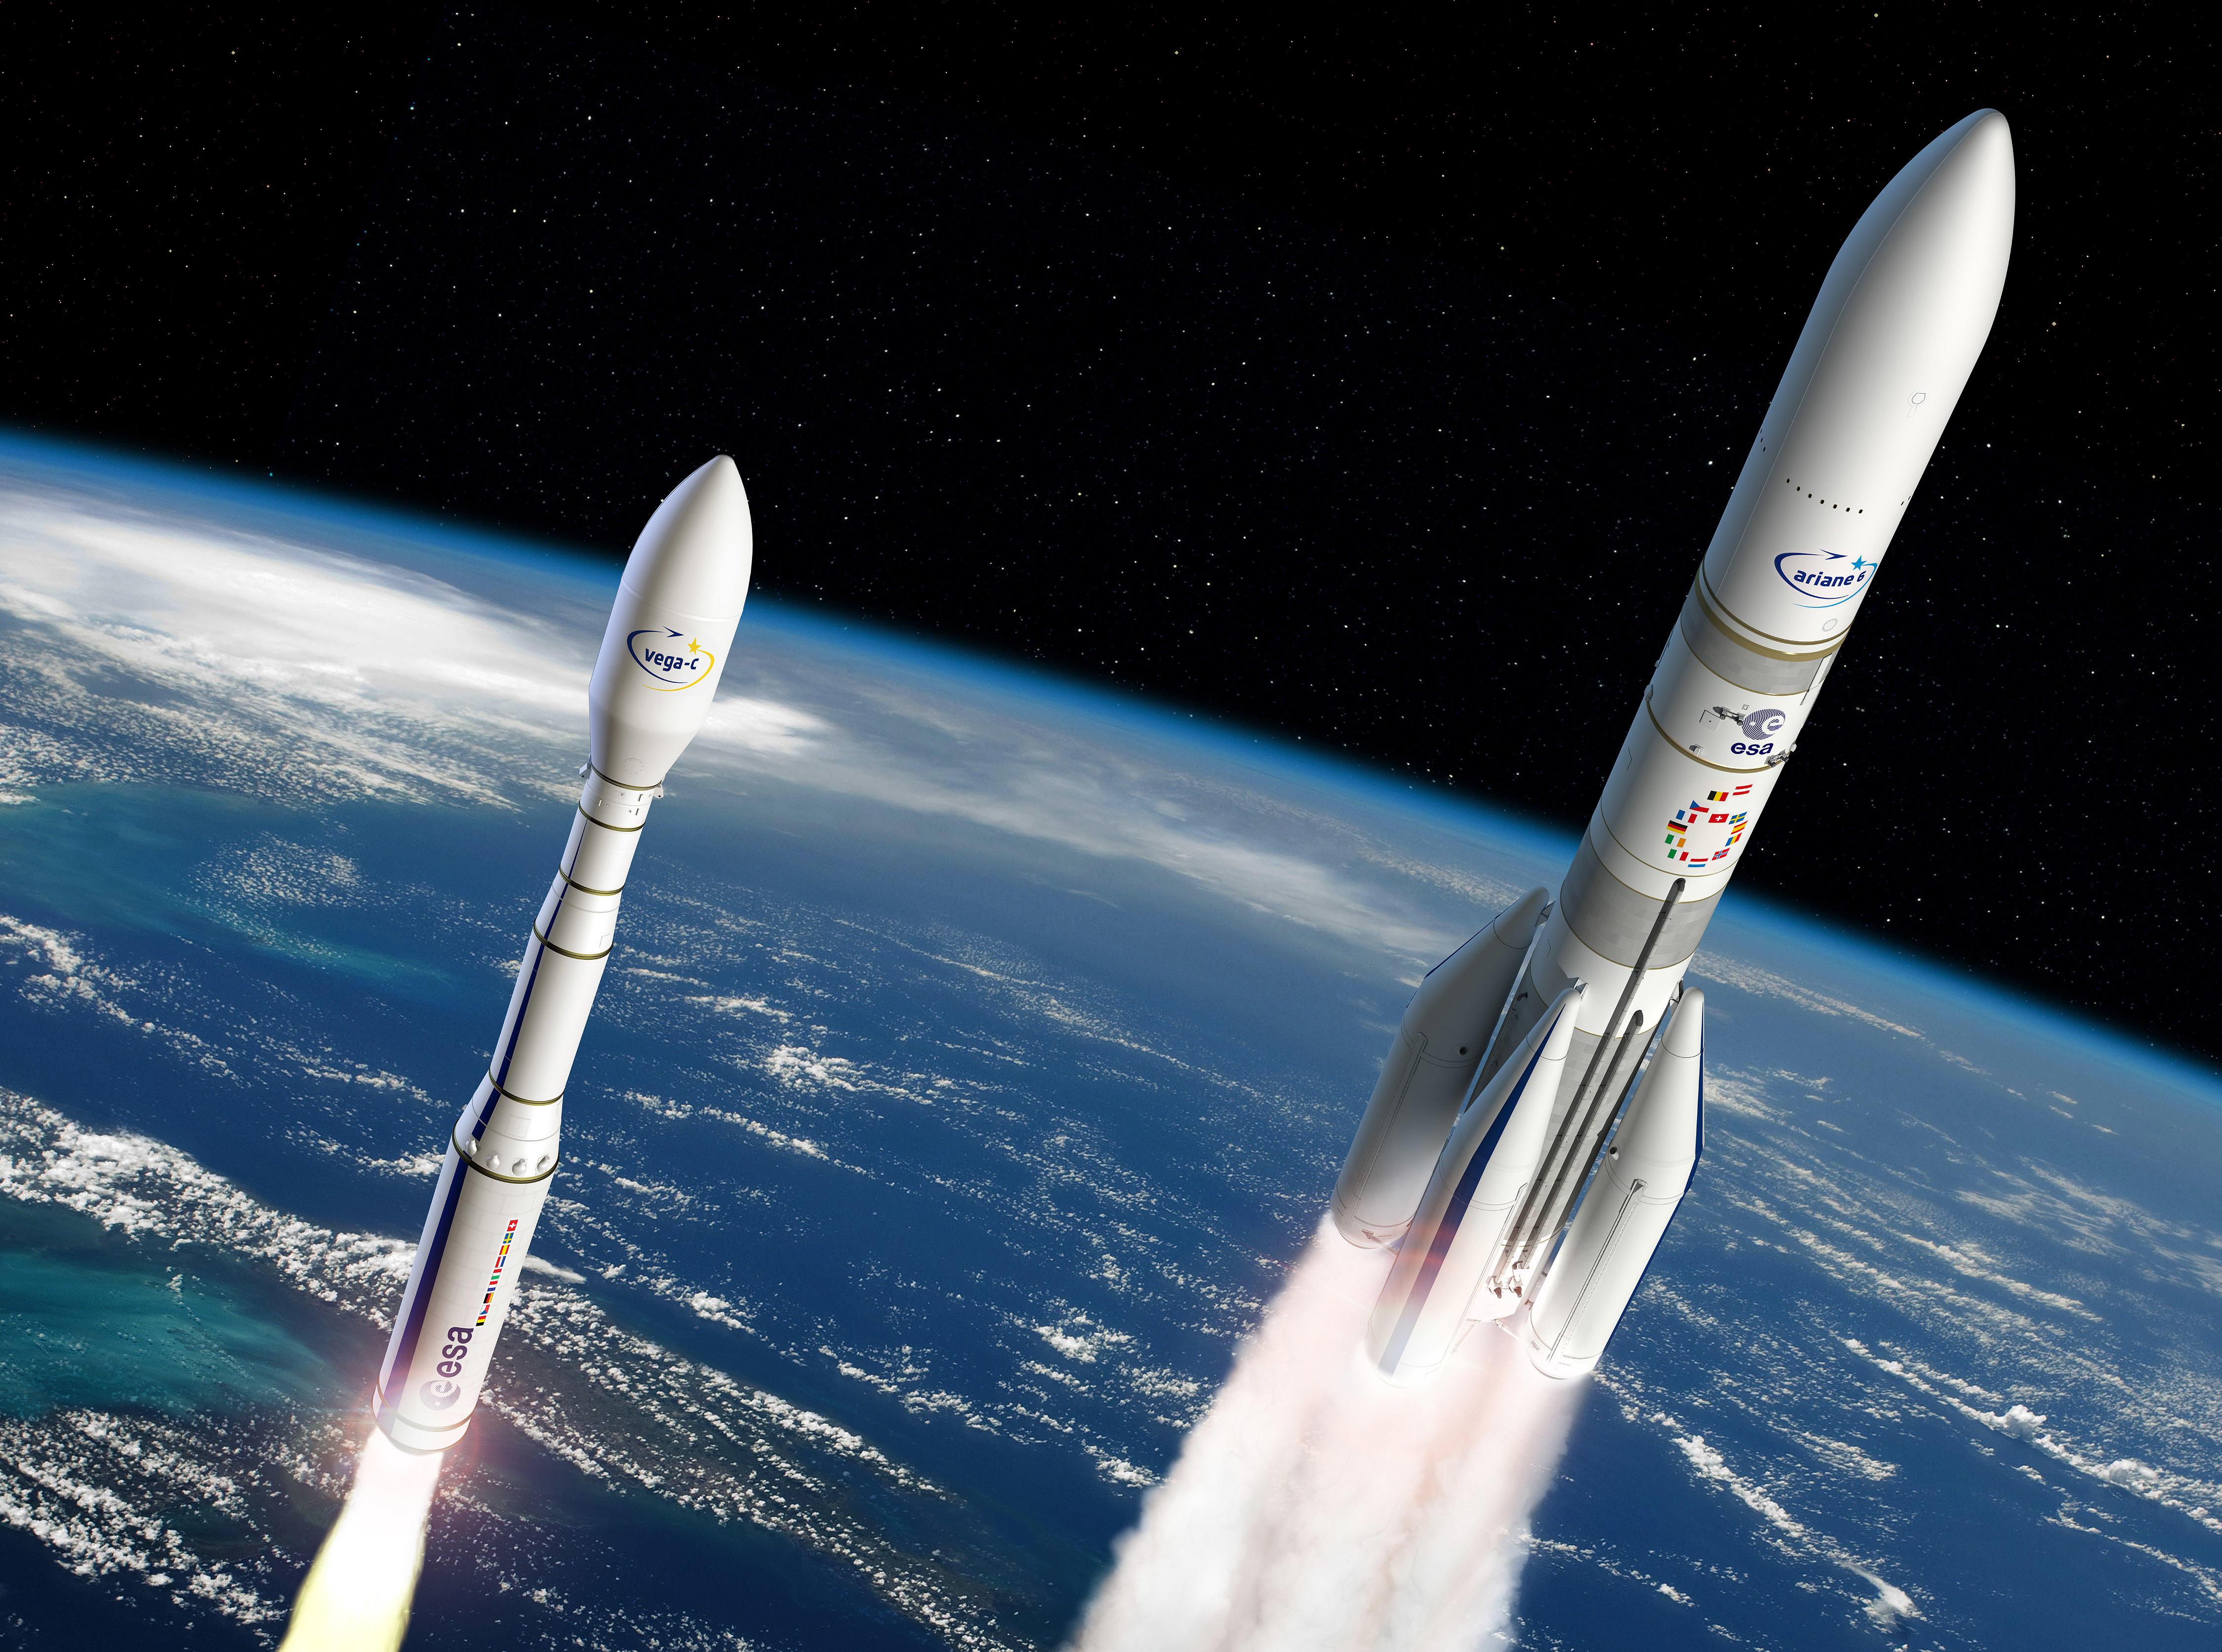 ракета, Ариан6, Ariane-6, Vega-C, Вега, ракетаноситель, космос, наука, техника, ESA, ЕКА